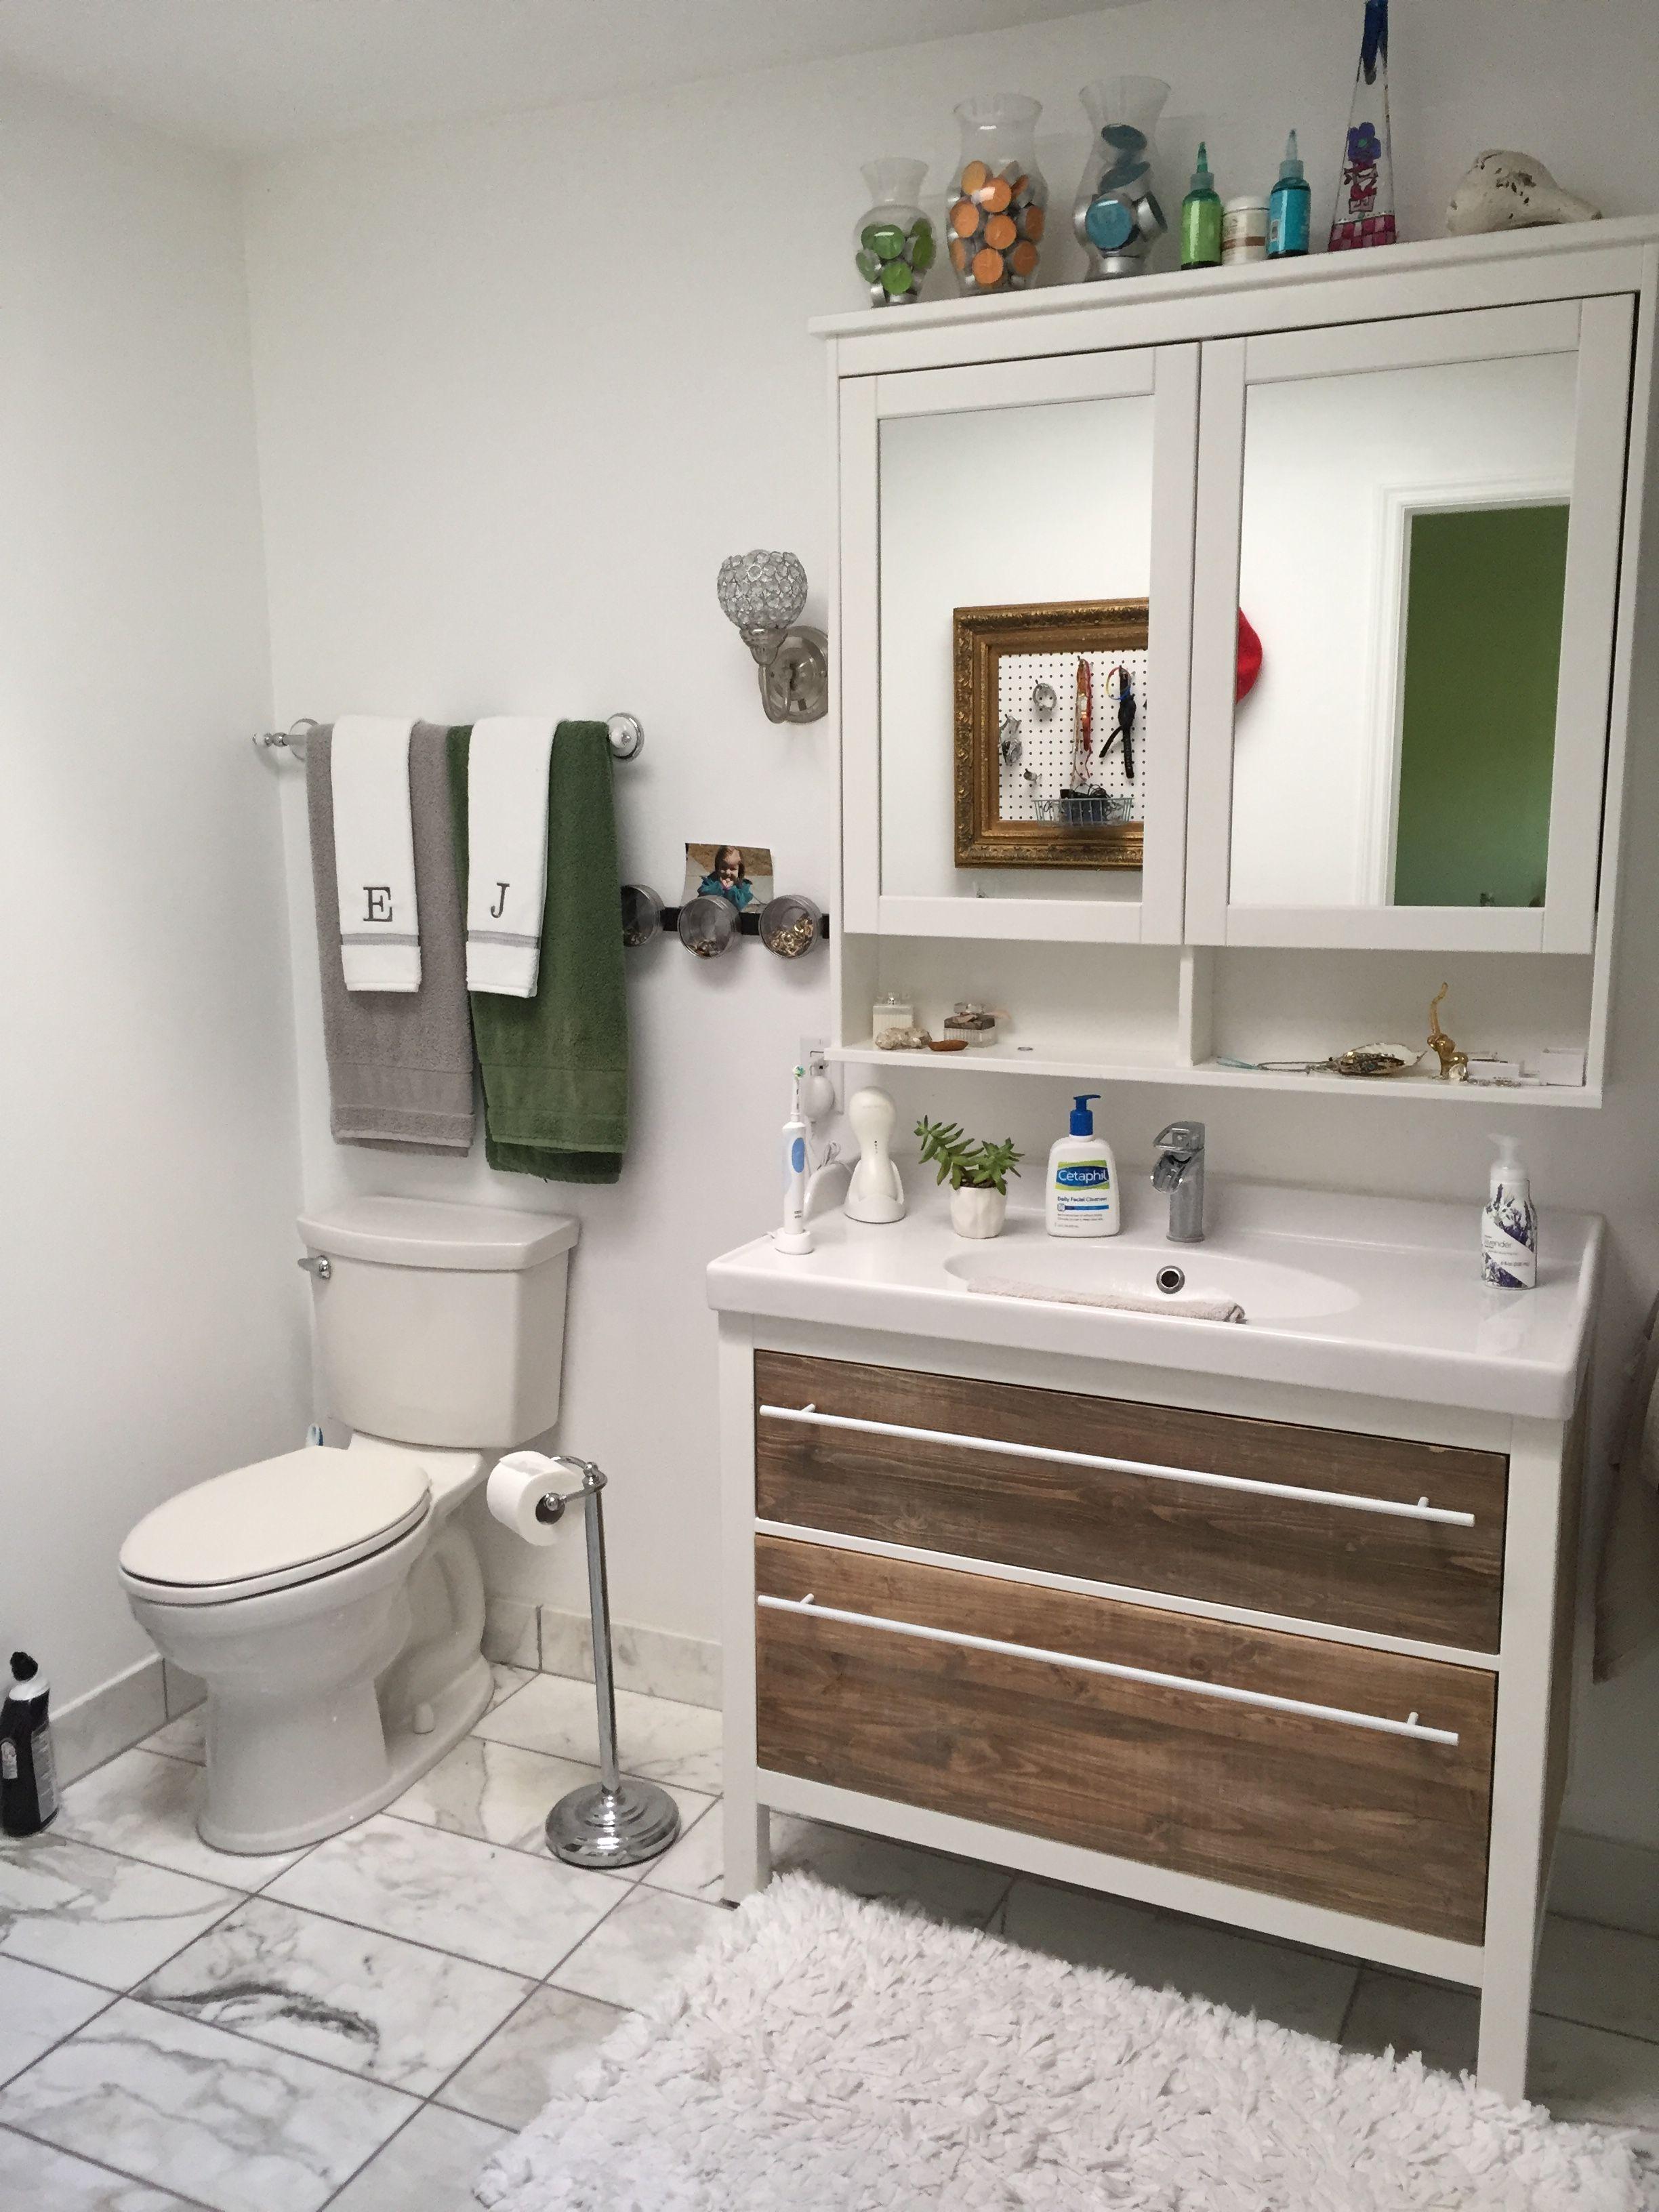 ikea bath vanity was water damaged i removed the drawer on ikea bathroom vanities id=11360